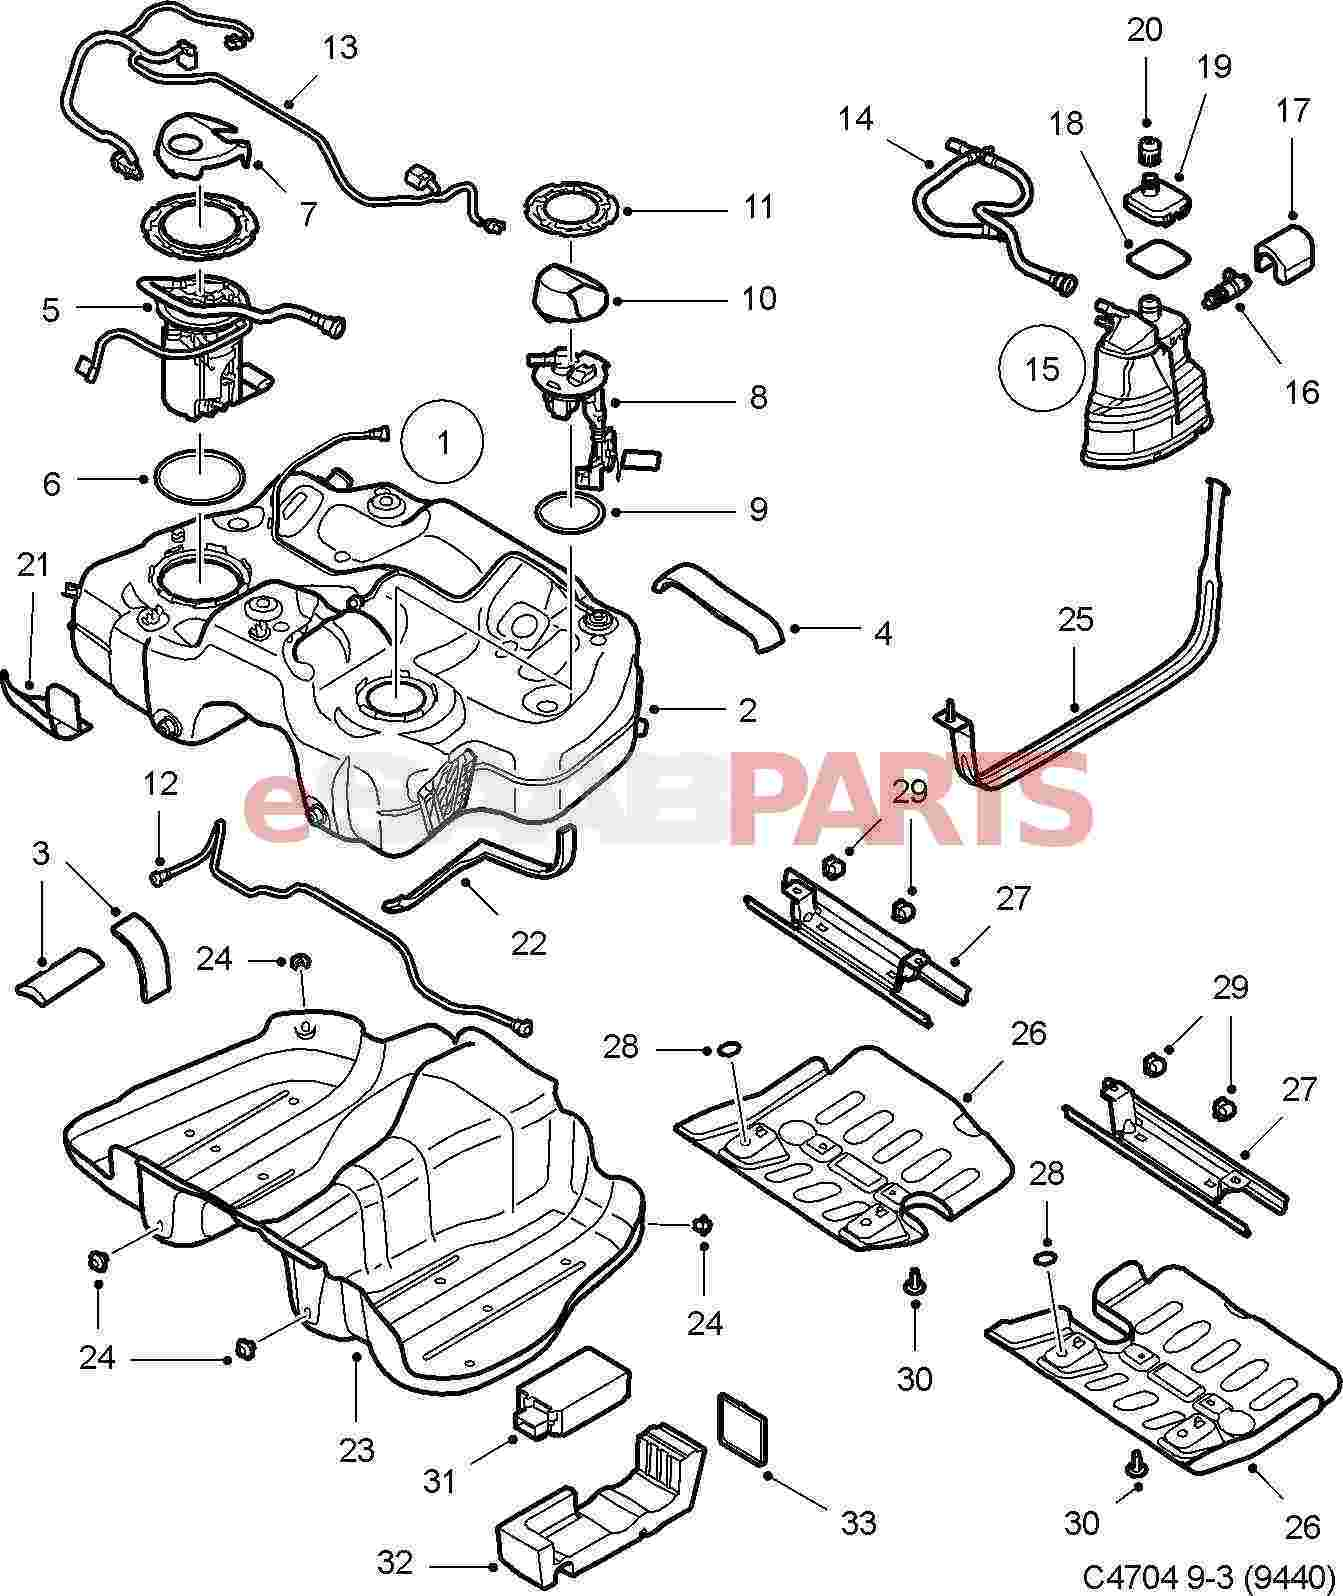 12780869 Saab Fuel Pump V6 Xwd Genuine Saab Parts